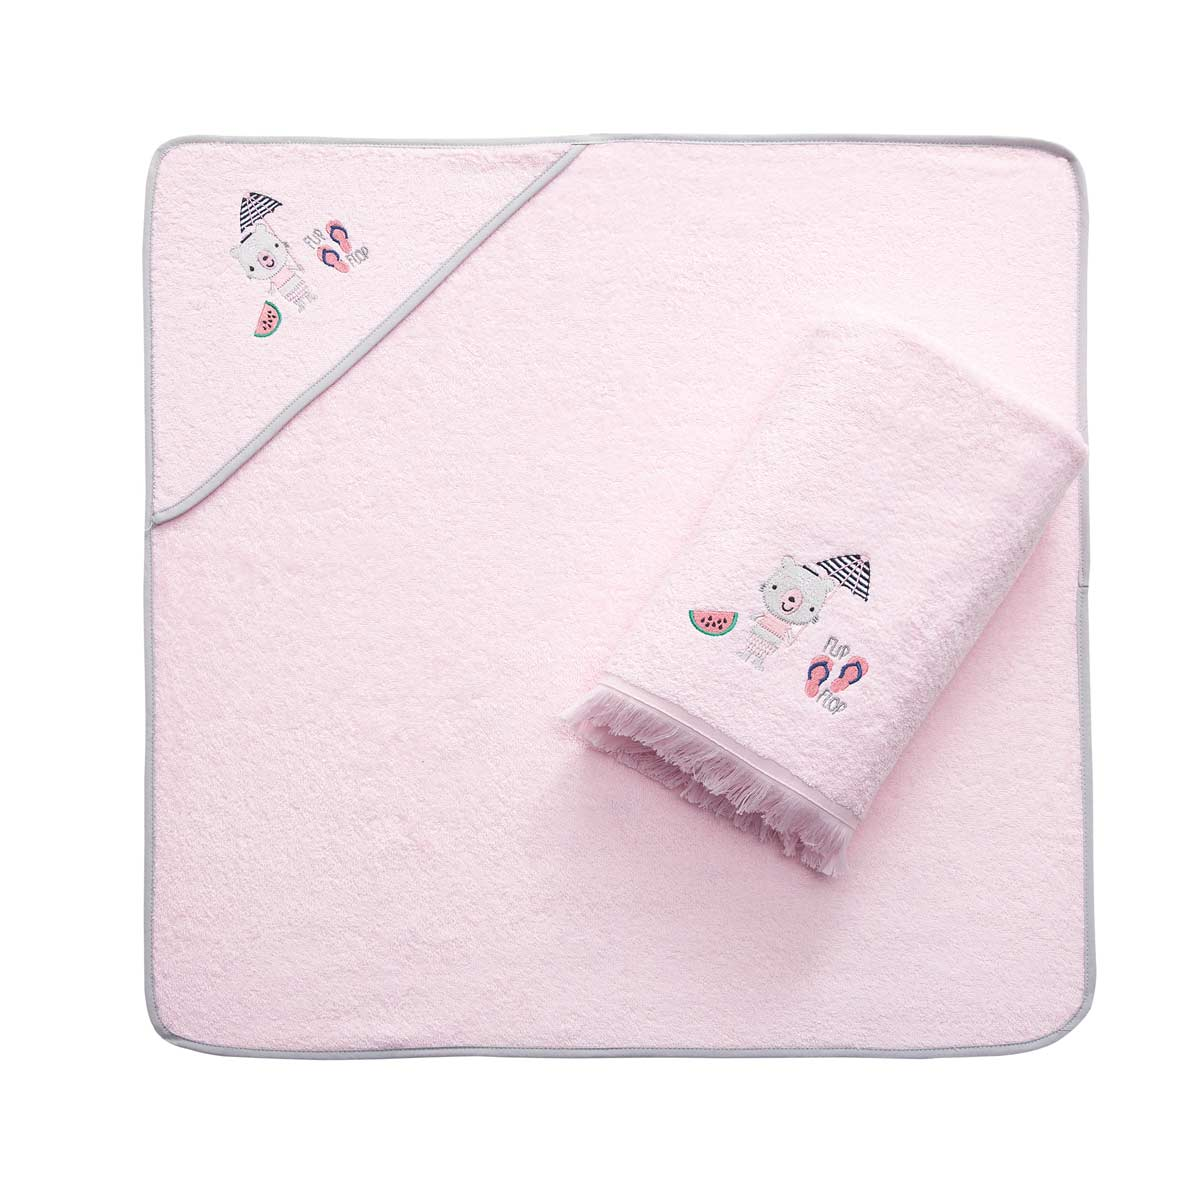 Полотенце и уголок банный Arya Summer Розовый махровый, 75х75/70х140